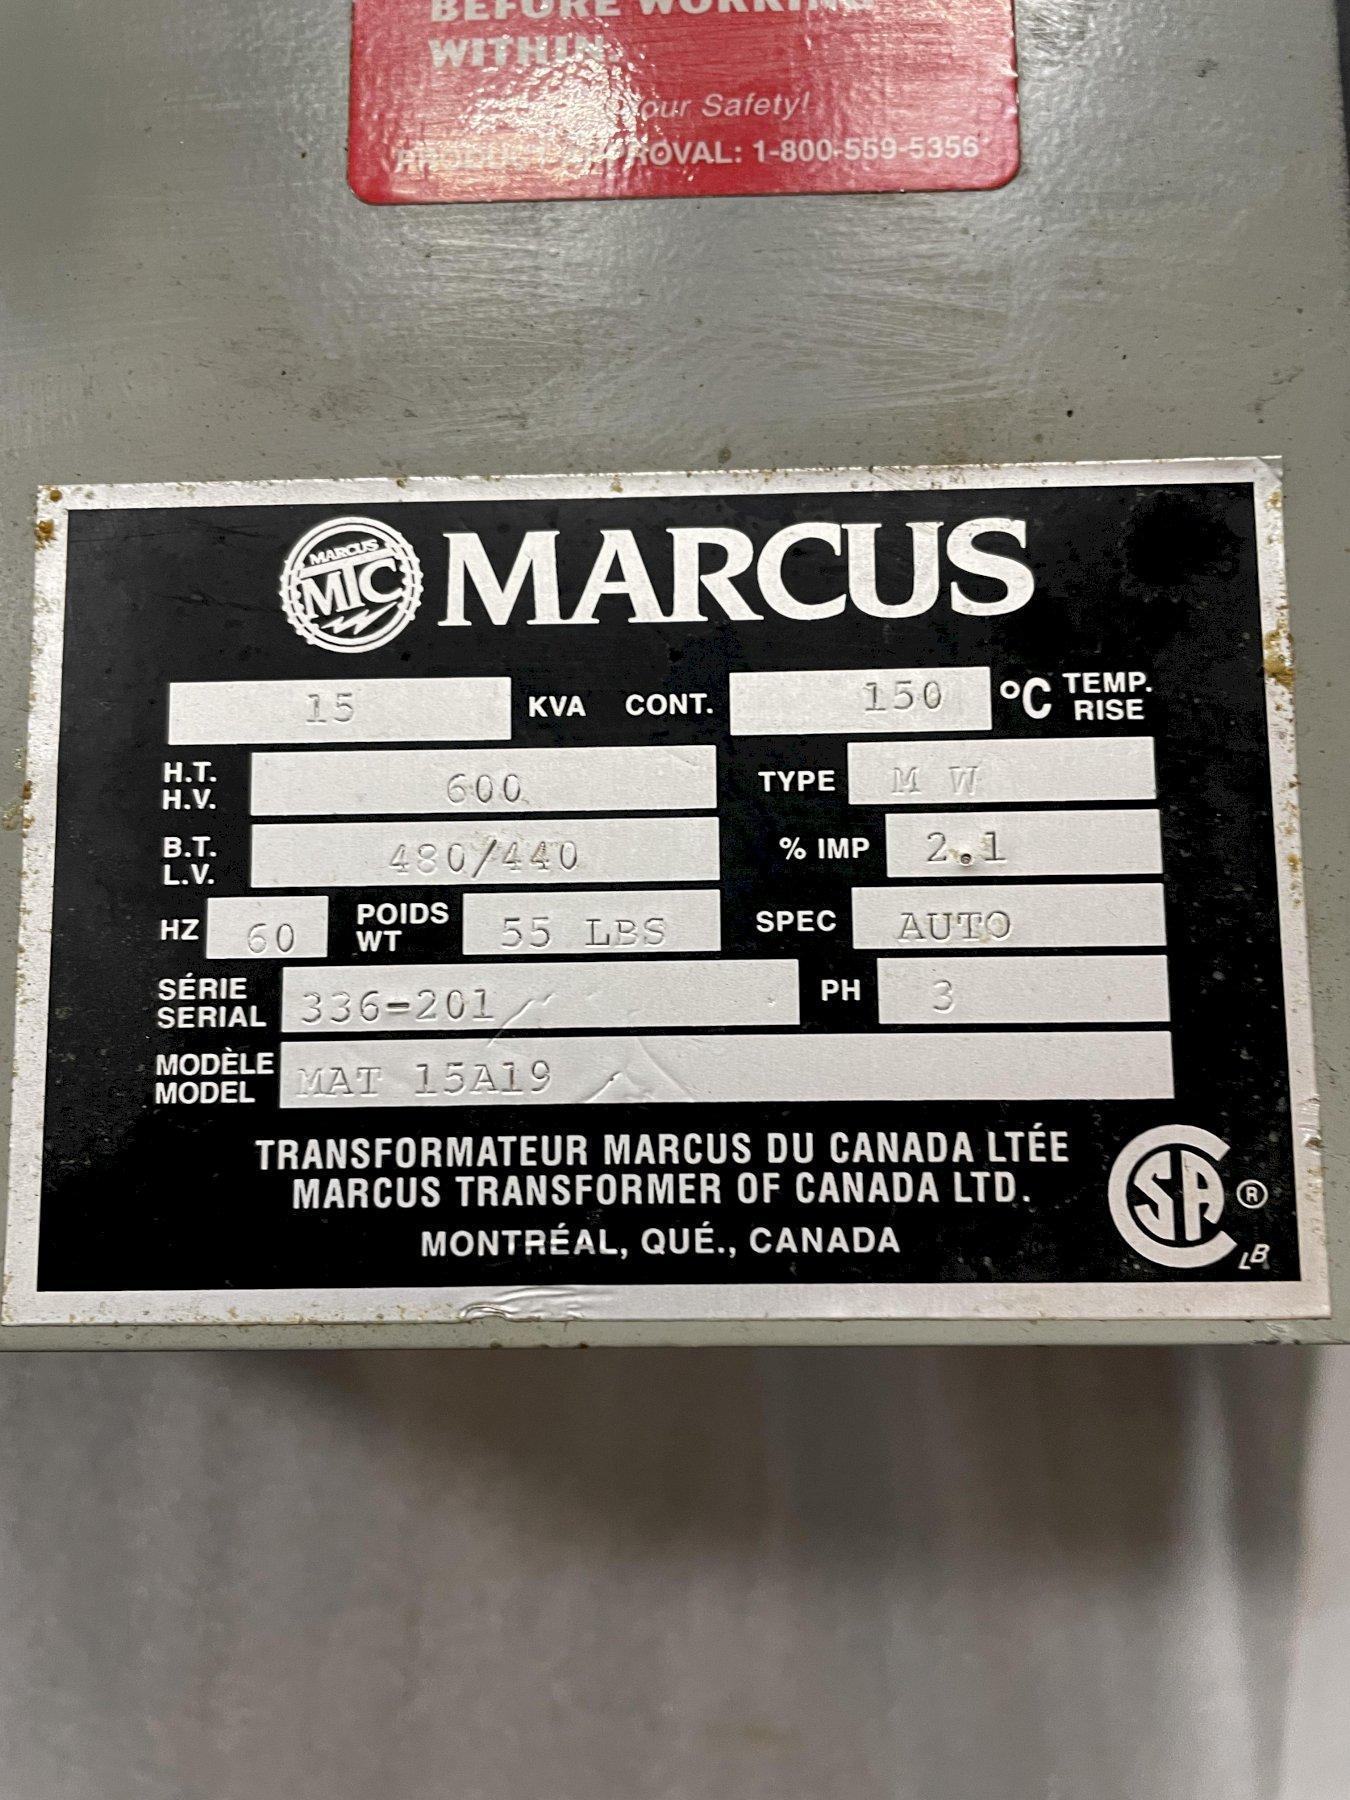 15 KVA MARCUS TRANSFORMER, 600-480/440/3